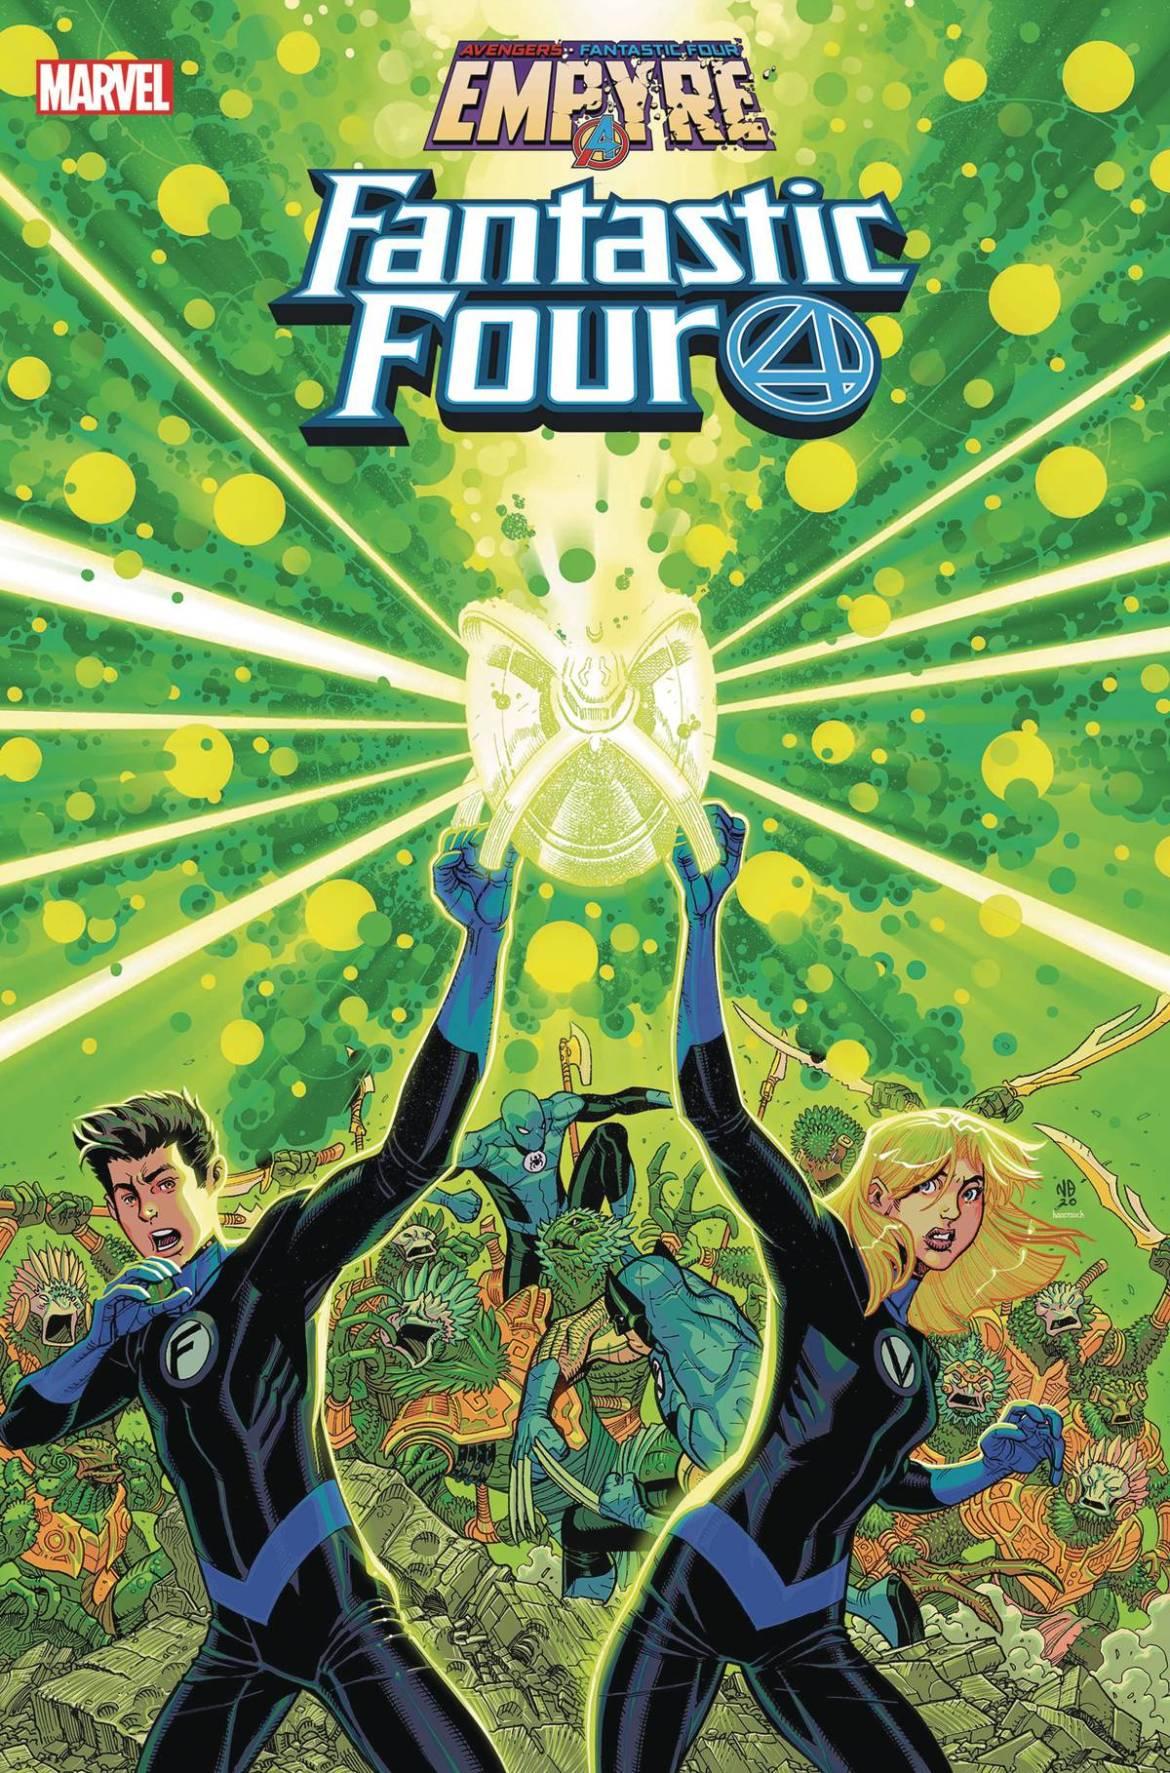 STL157164 ComicList: Marvel Comics New Releases for 09/02/2020